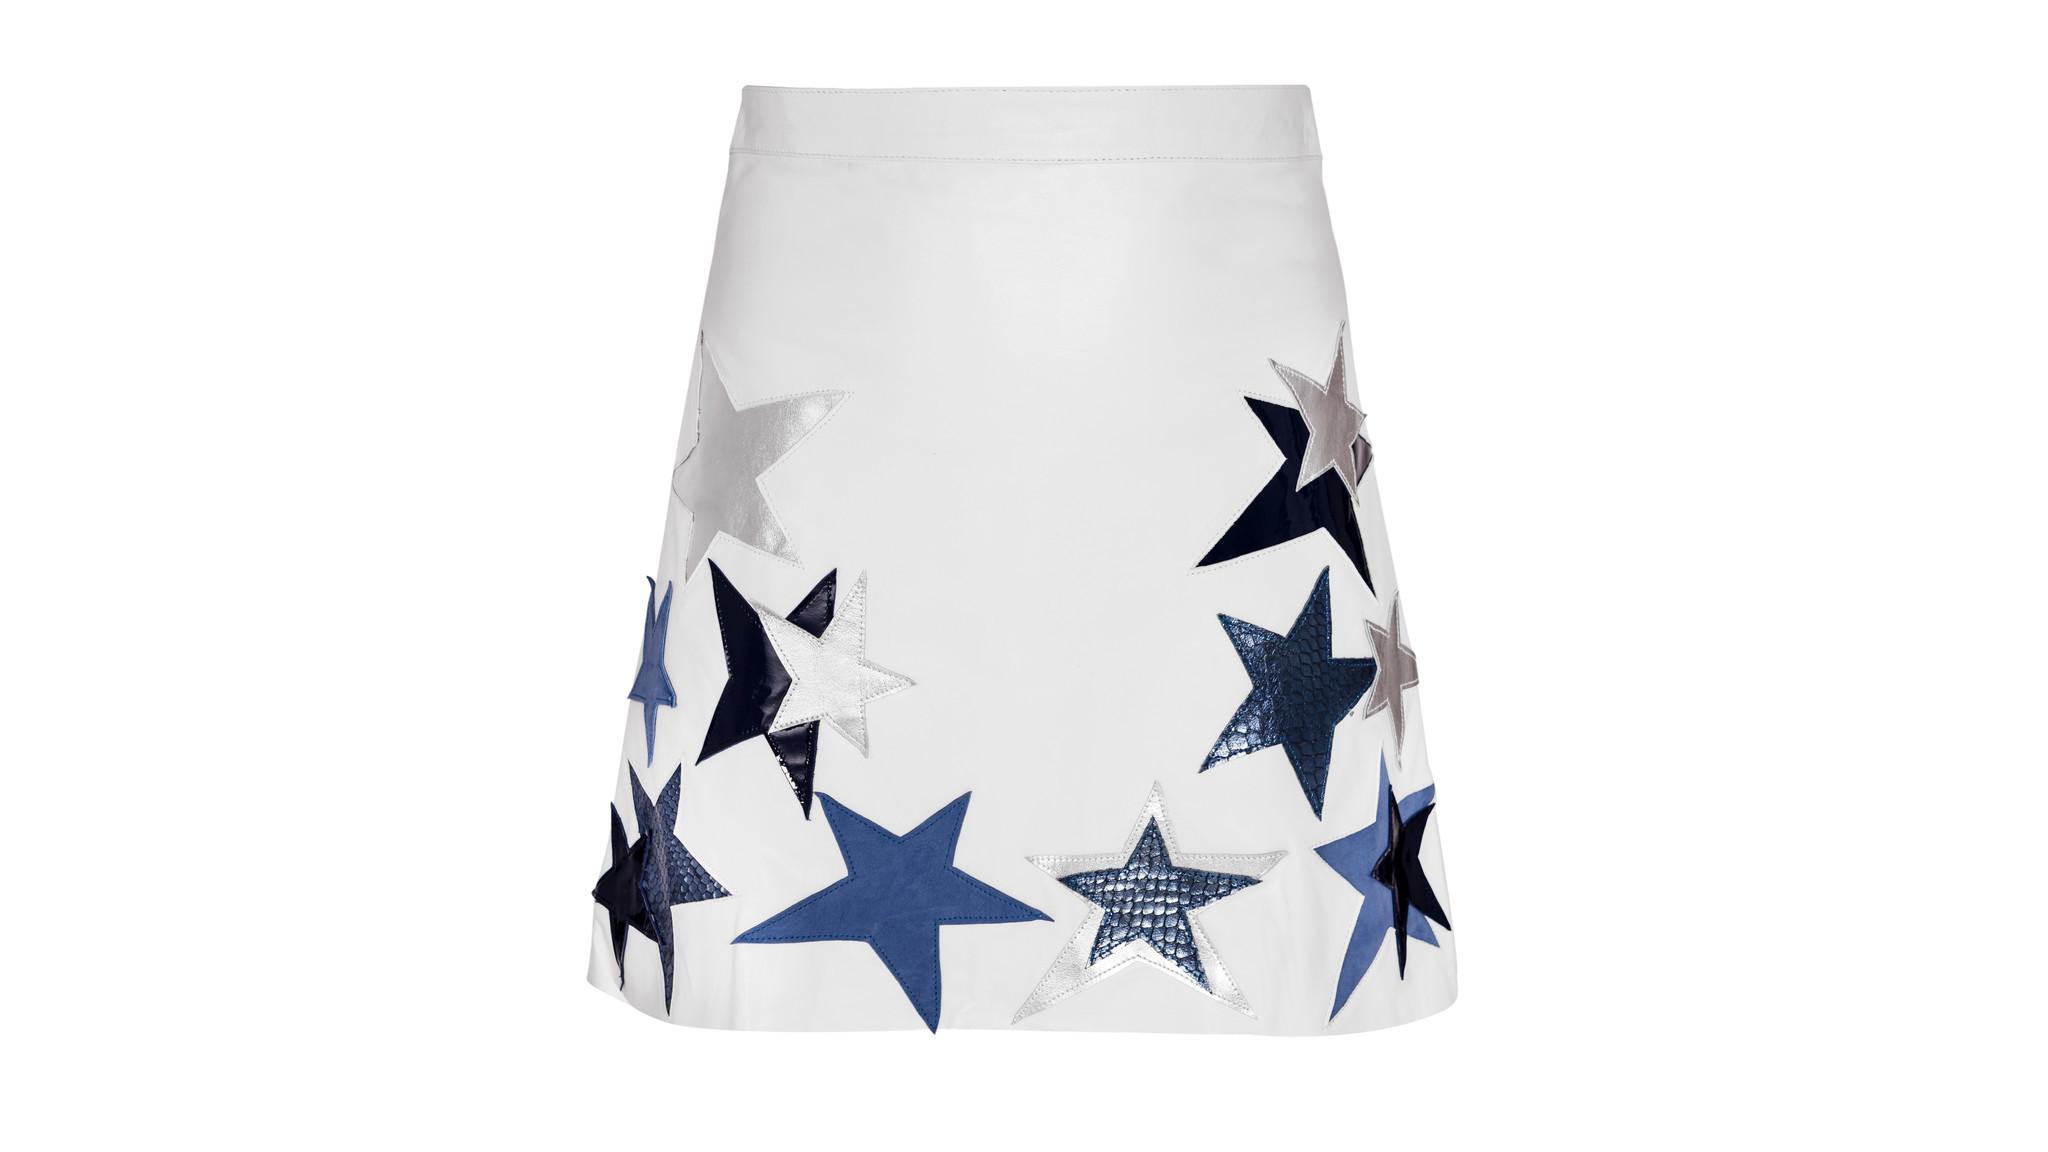 Designer: Manokhi Photo credit: Constin Lazarescu Manokhi's white leather mini-skirt has blue py